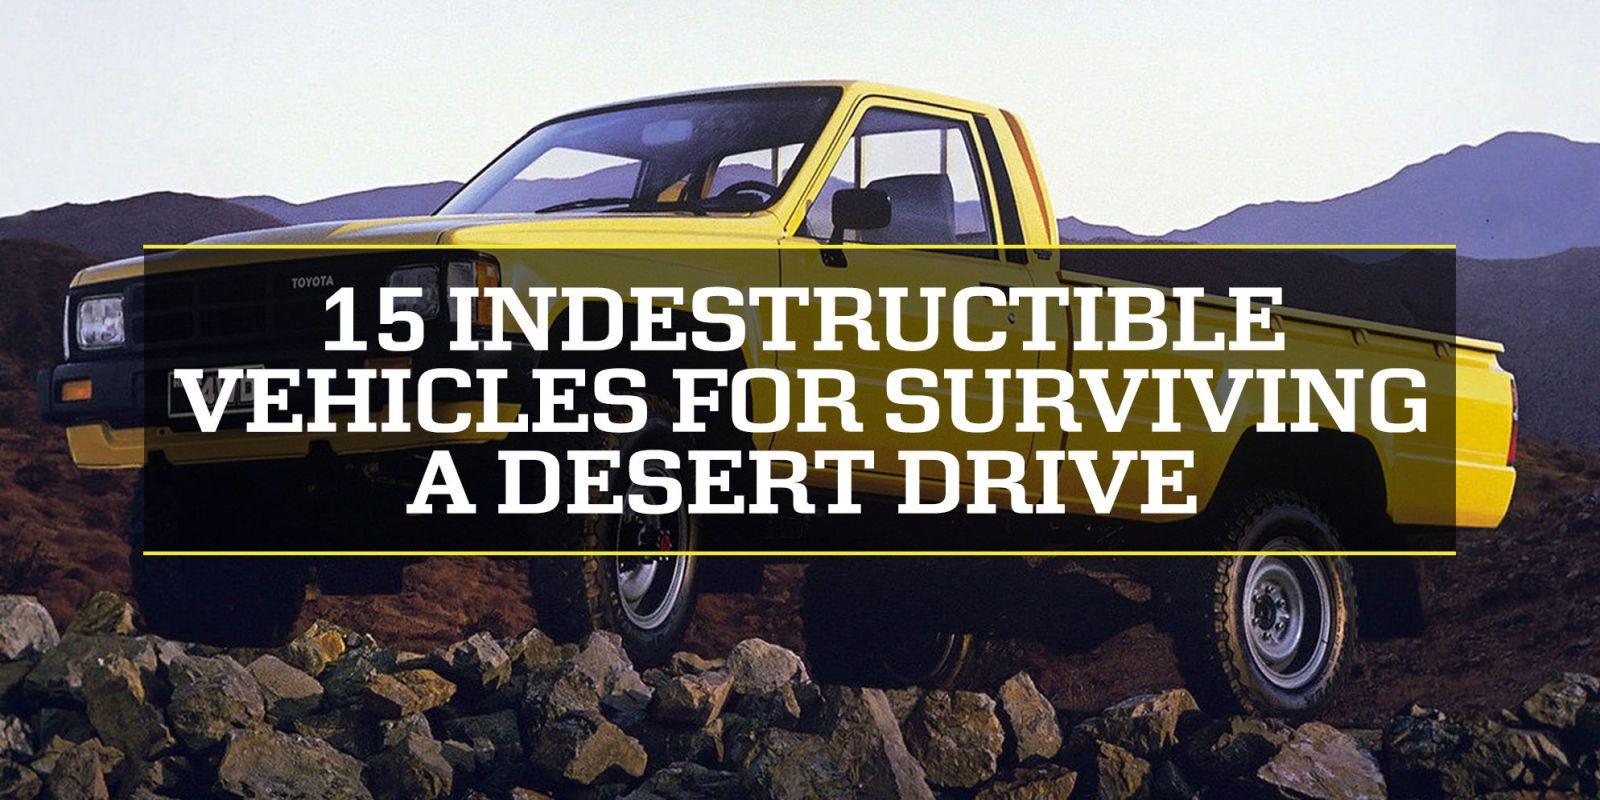 15 Indestructible Vehicles For Surviving a Drive Across the Desert